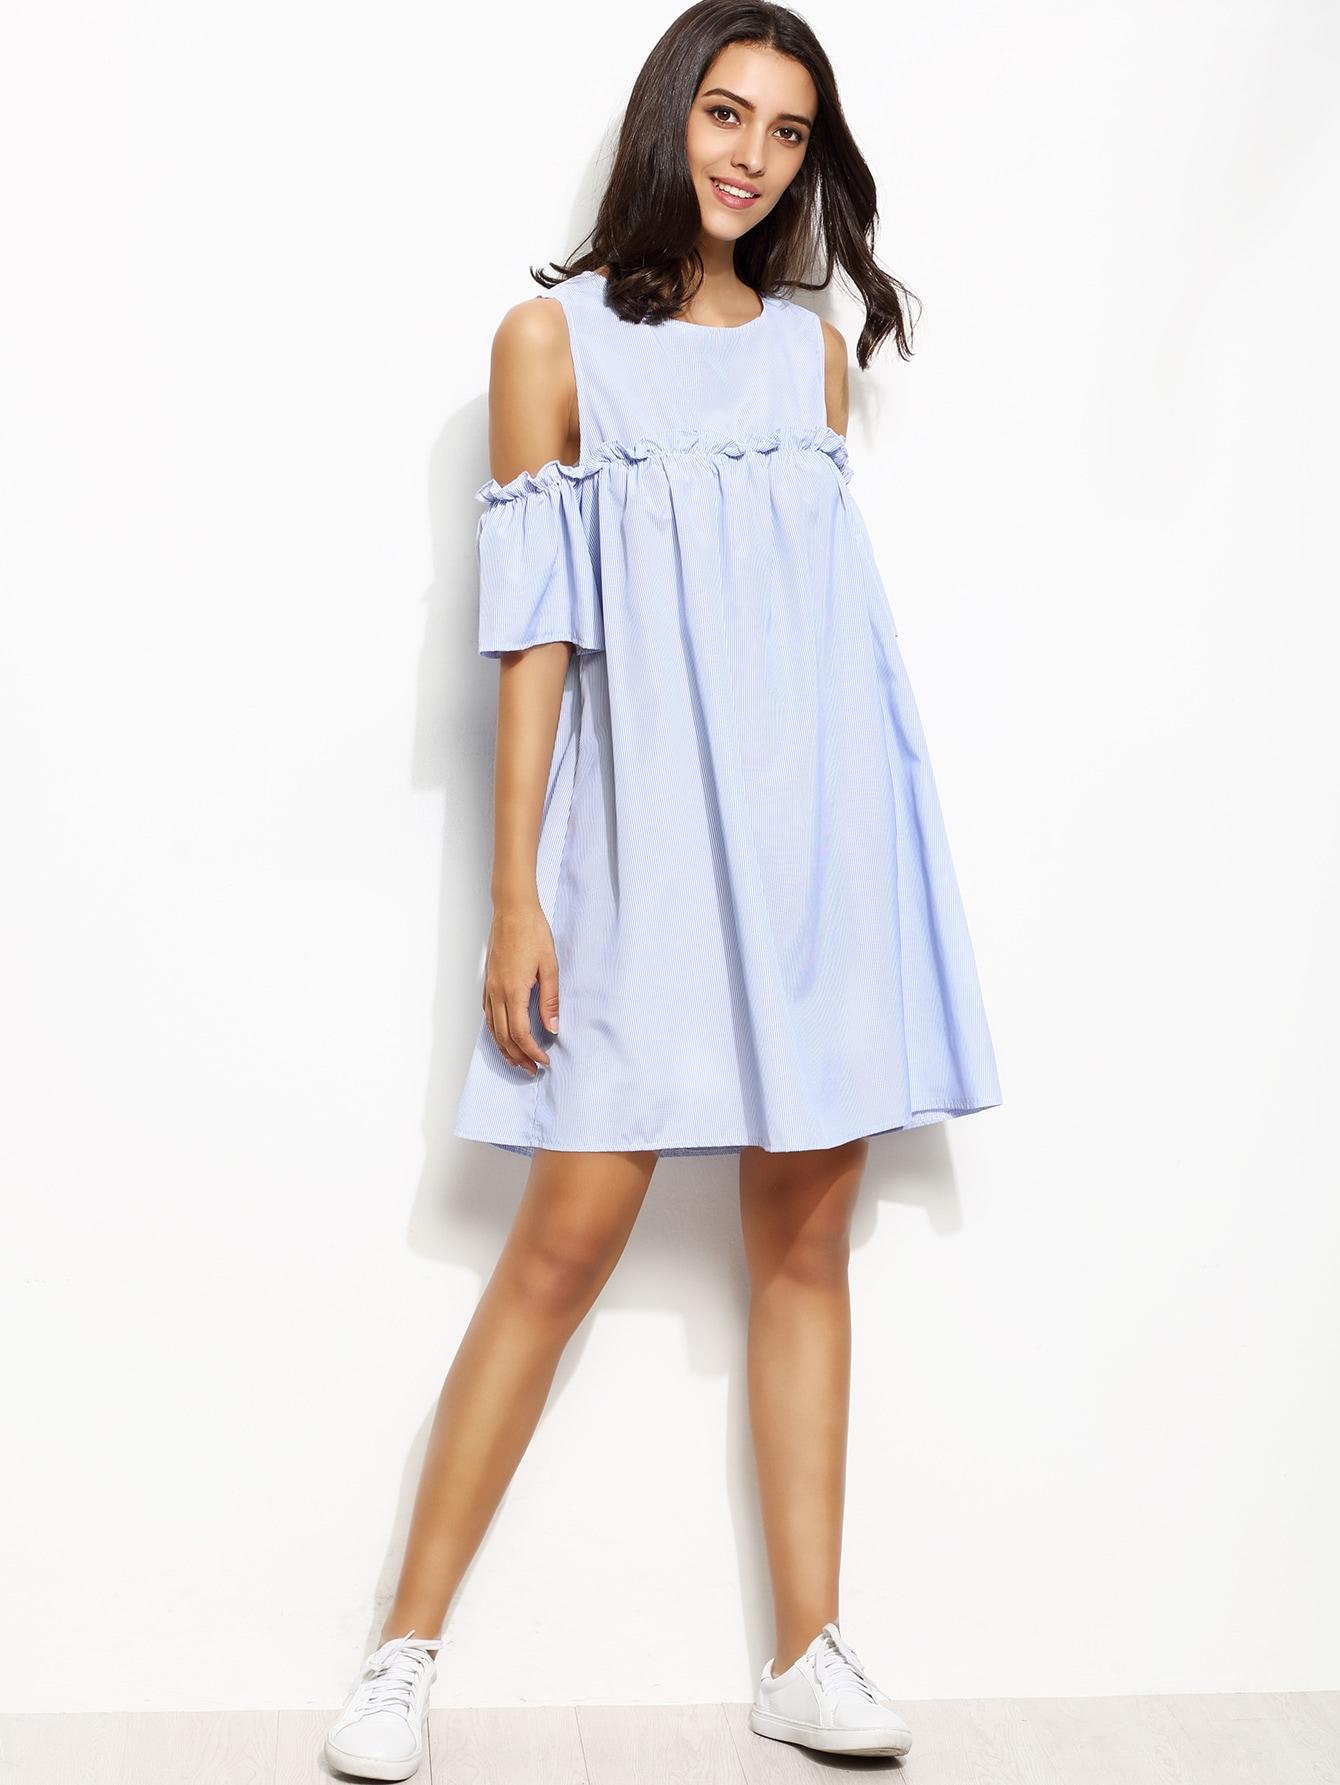 Vertical Striped Frill Trim Open Shoulder Dress